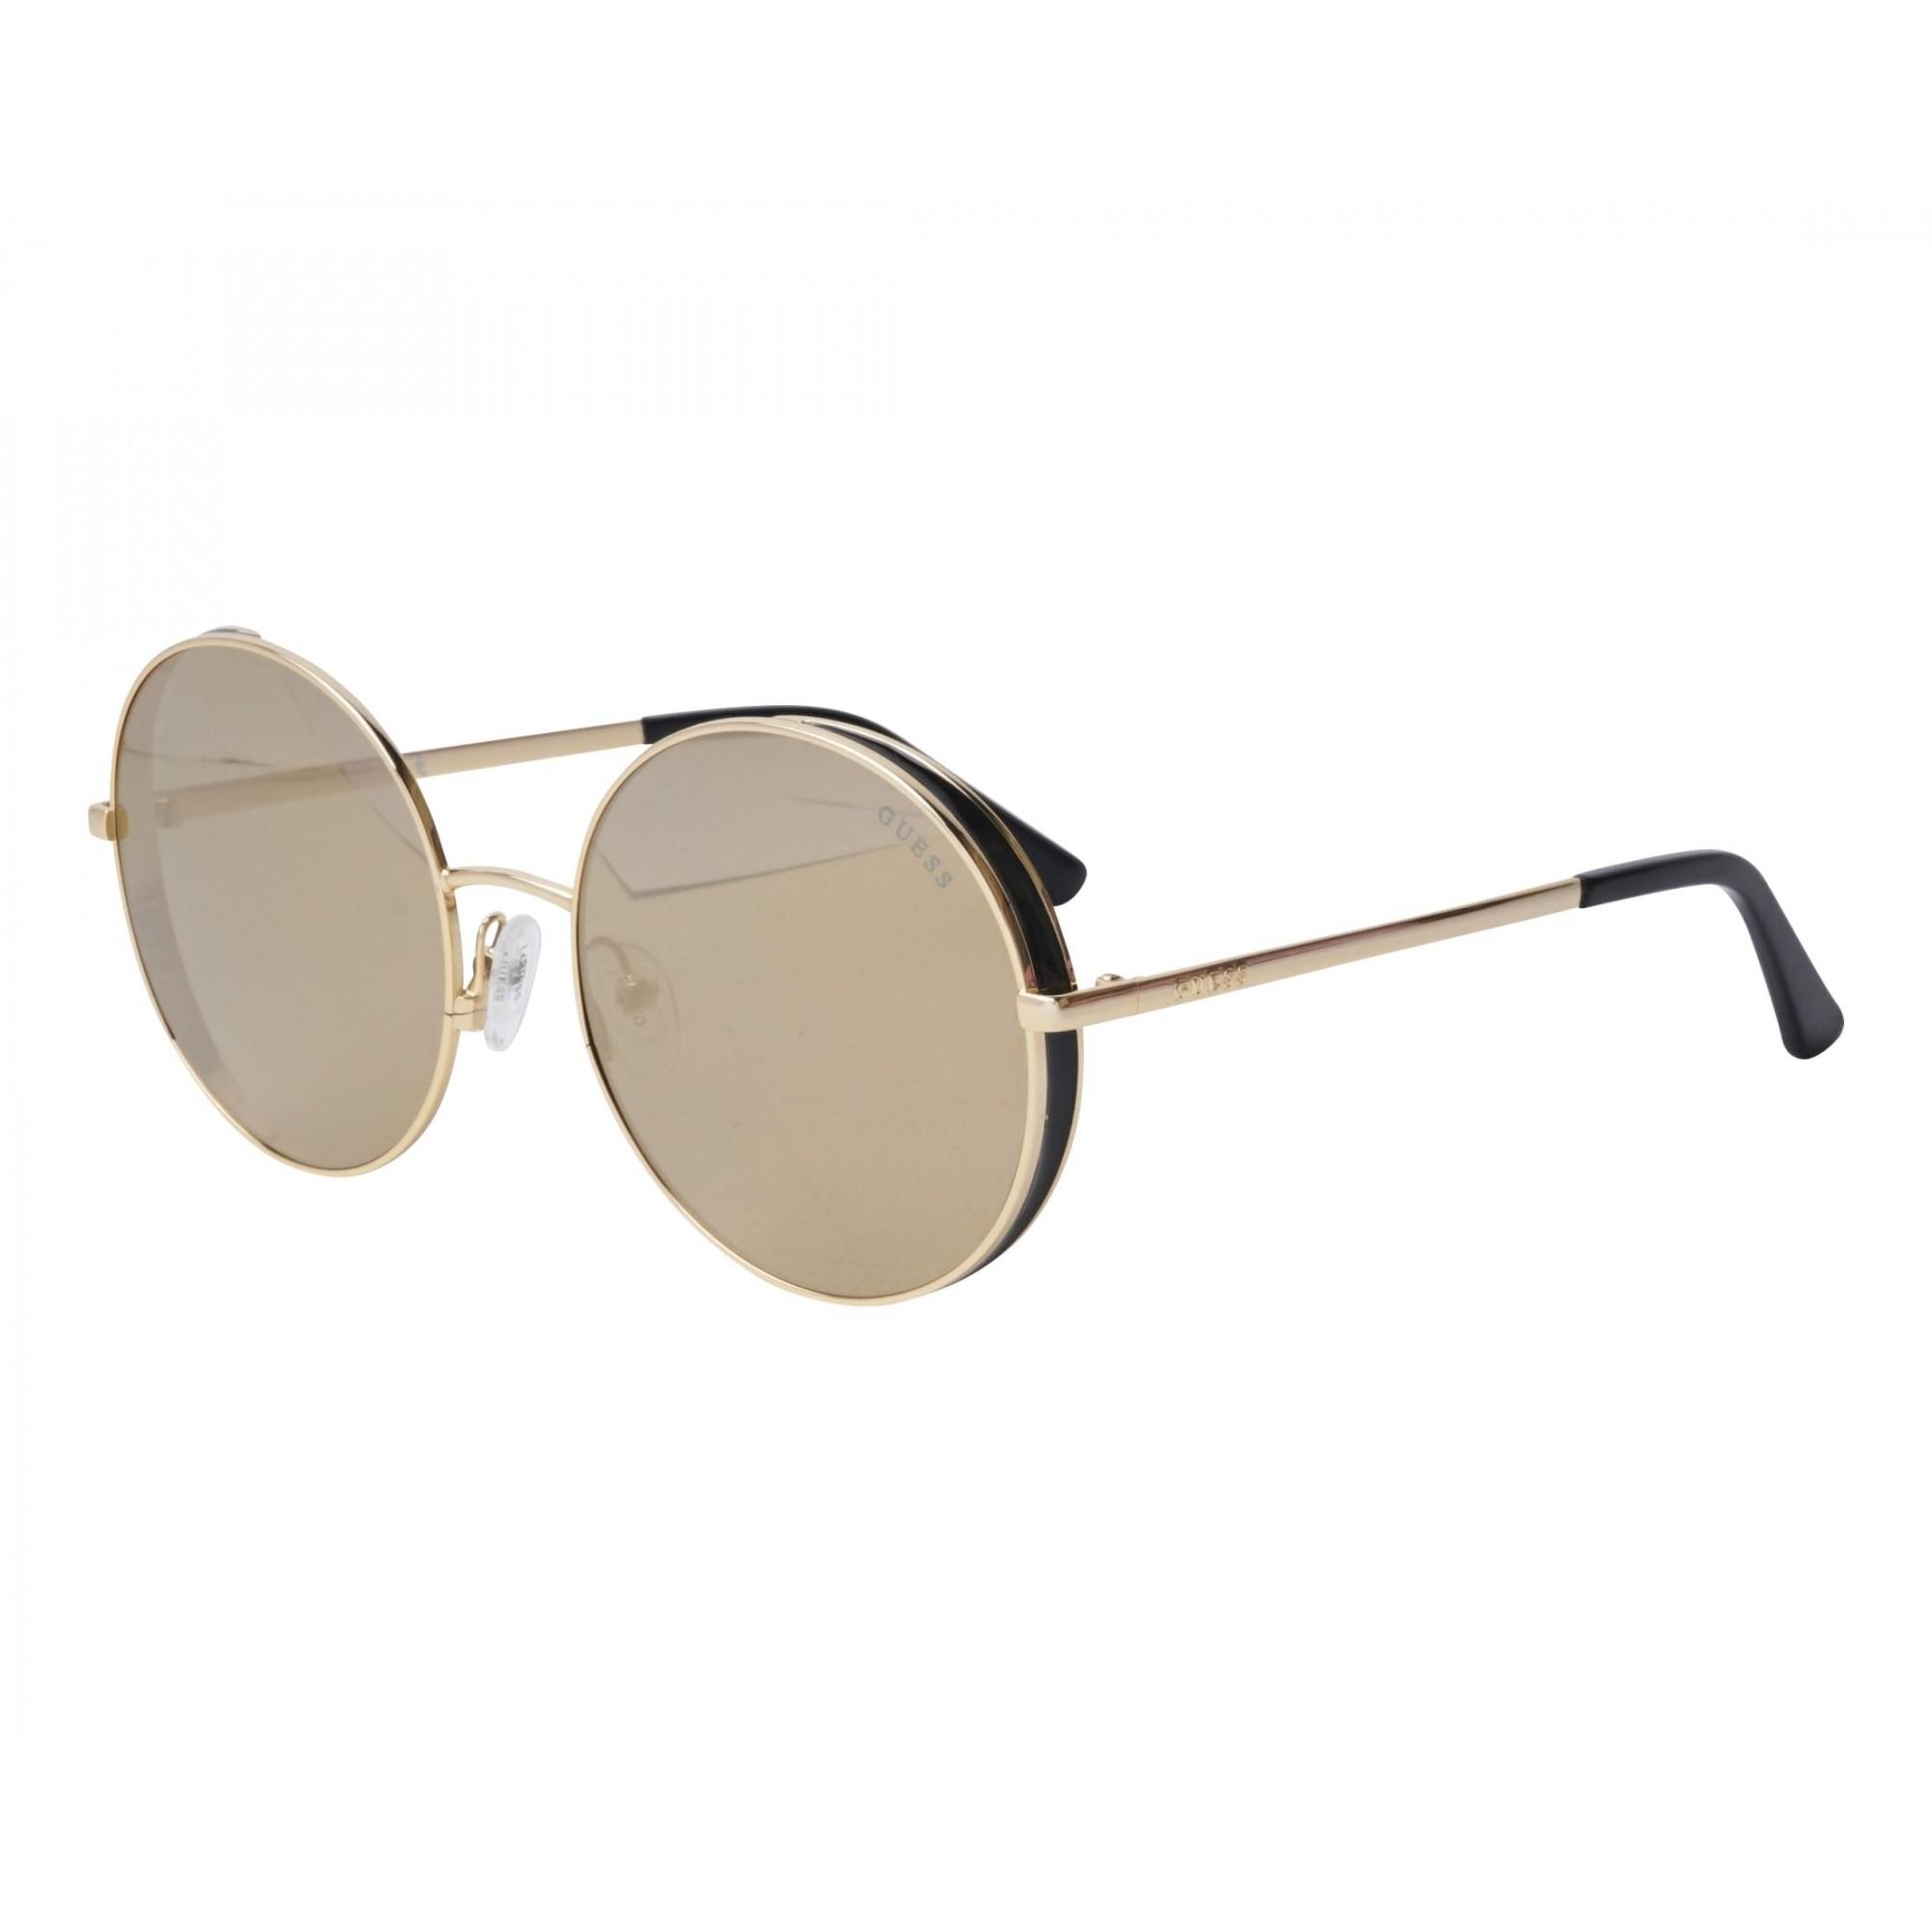 Guess - GU7606 32G 57 - Óculos de Sol